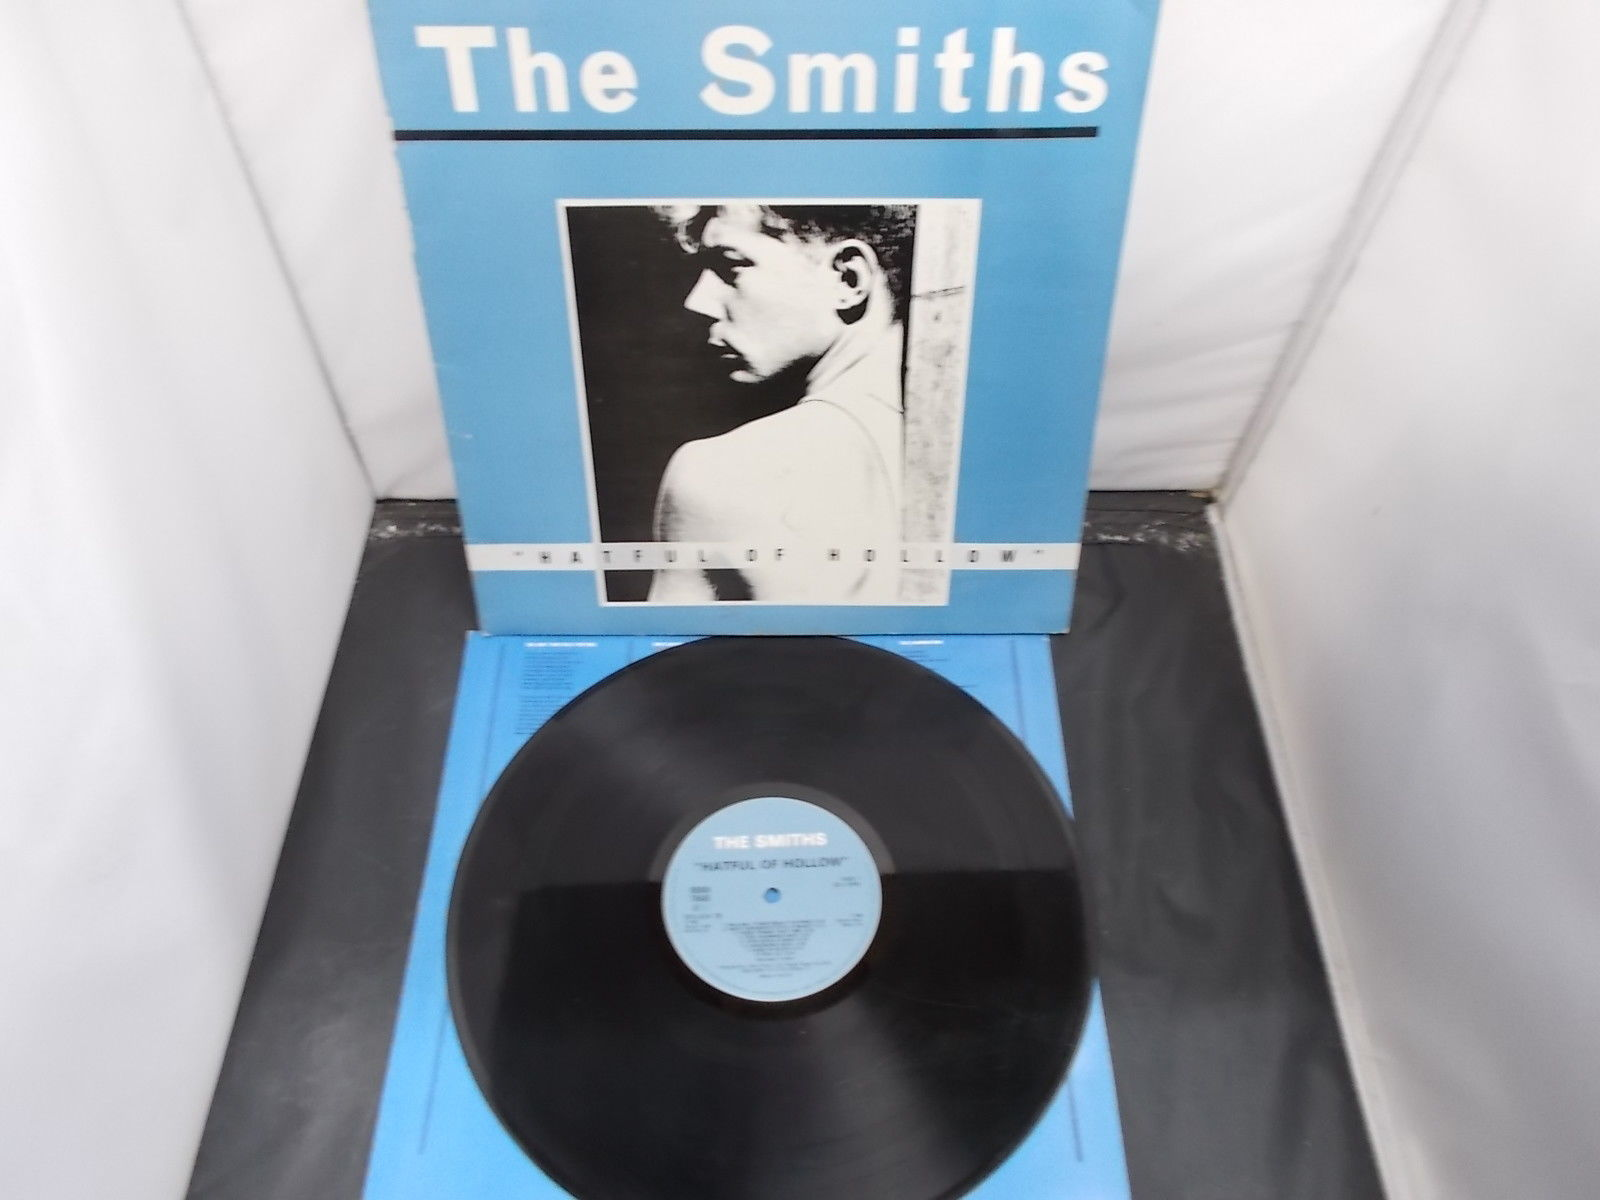 Vinyl record LP Album THE SMITHS HATEFUL OF HOLLOW (11)